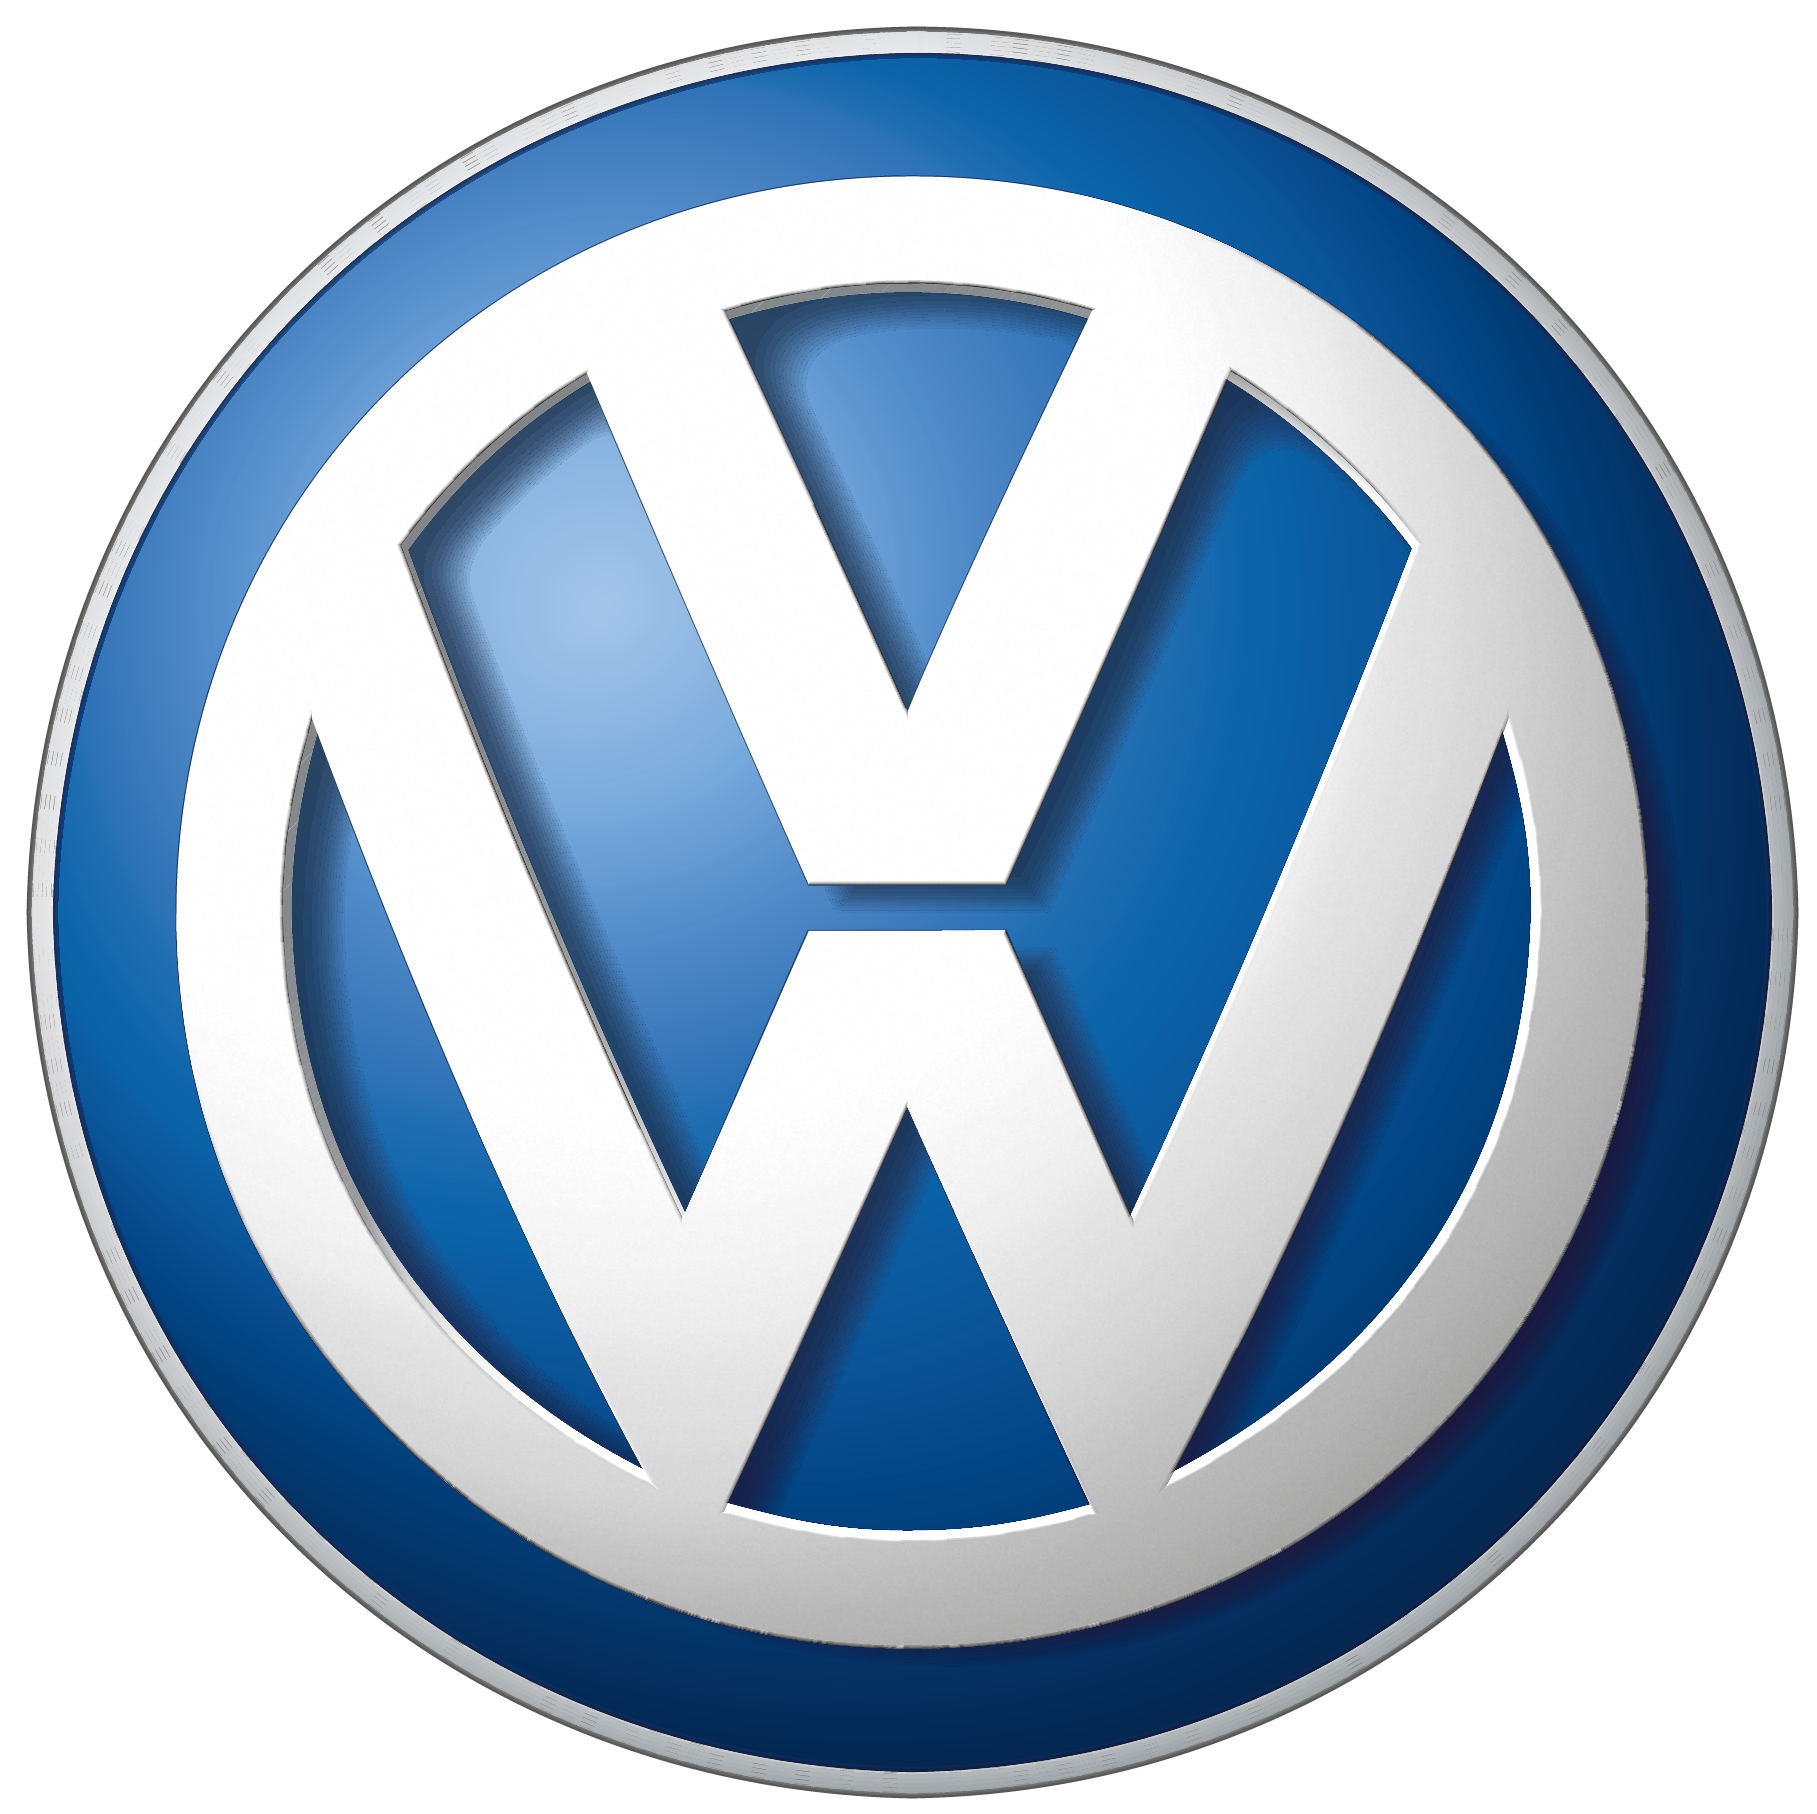 Volkswagen Car Logo Png Brand Image - Car, Transparent background PNG HD thumbnail